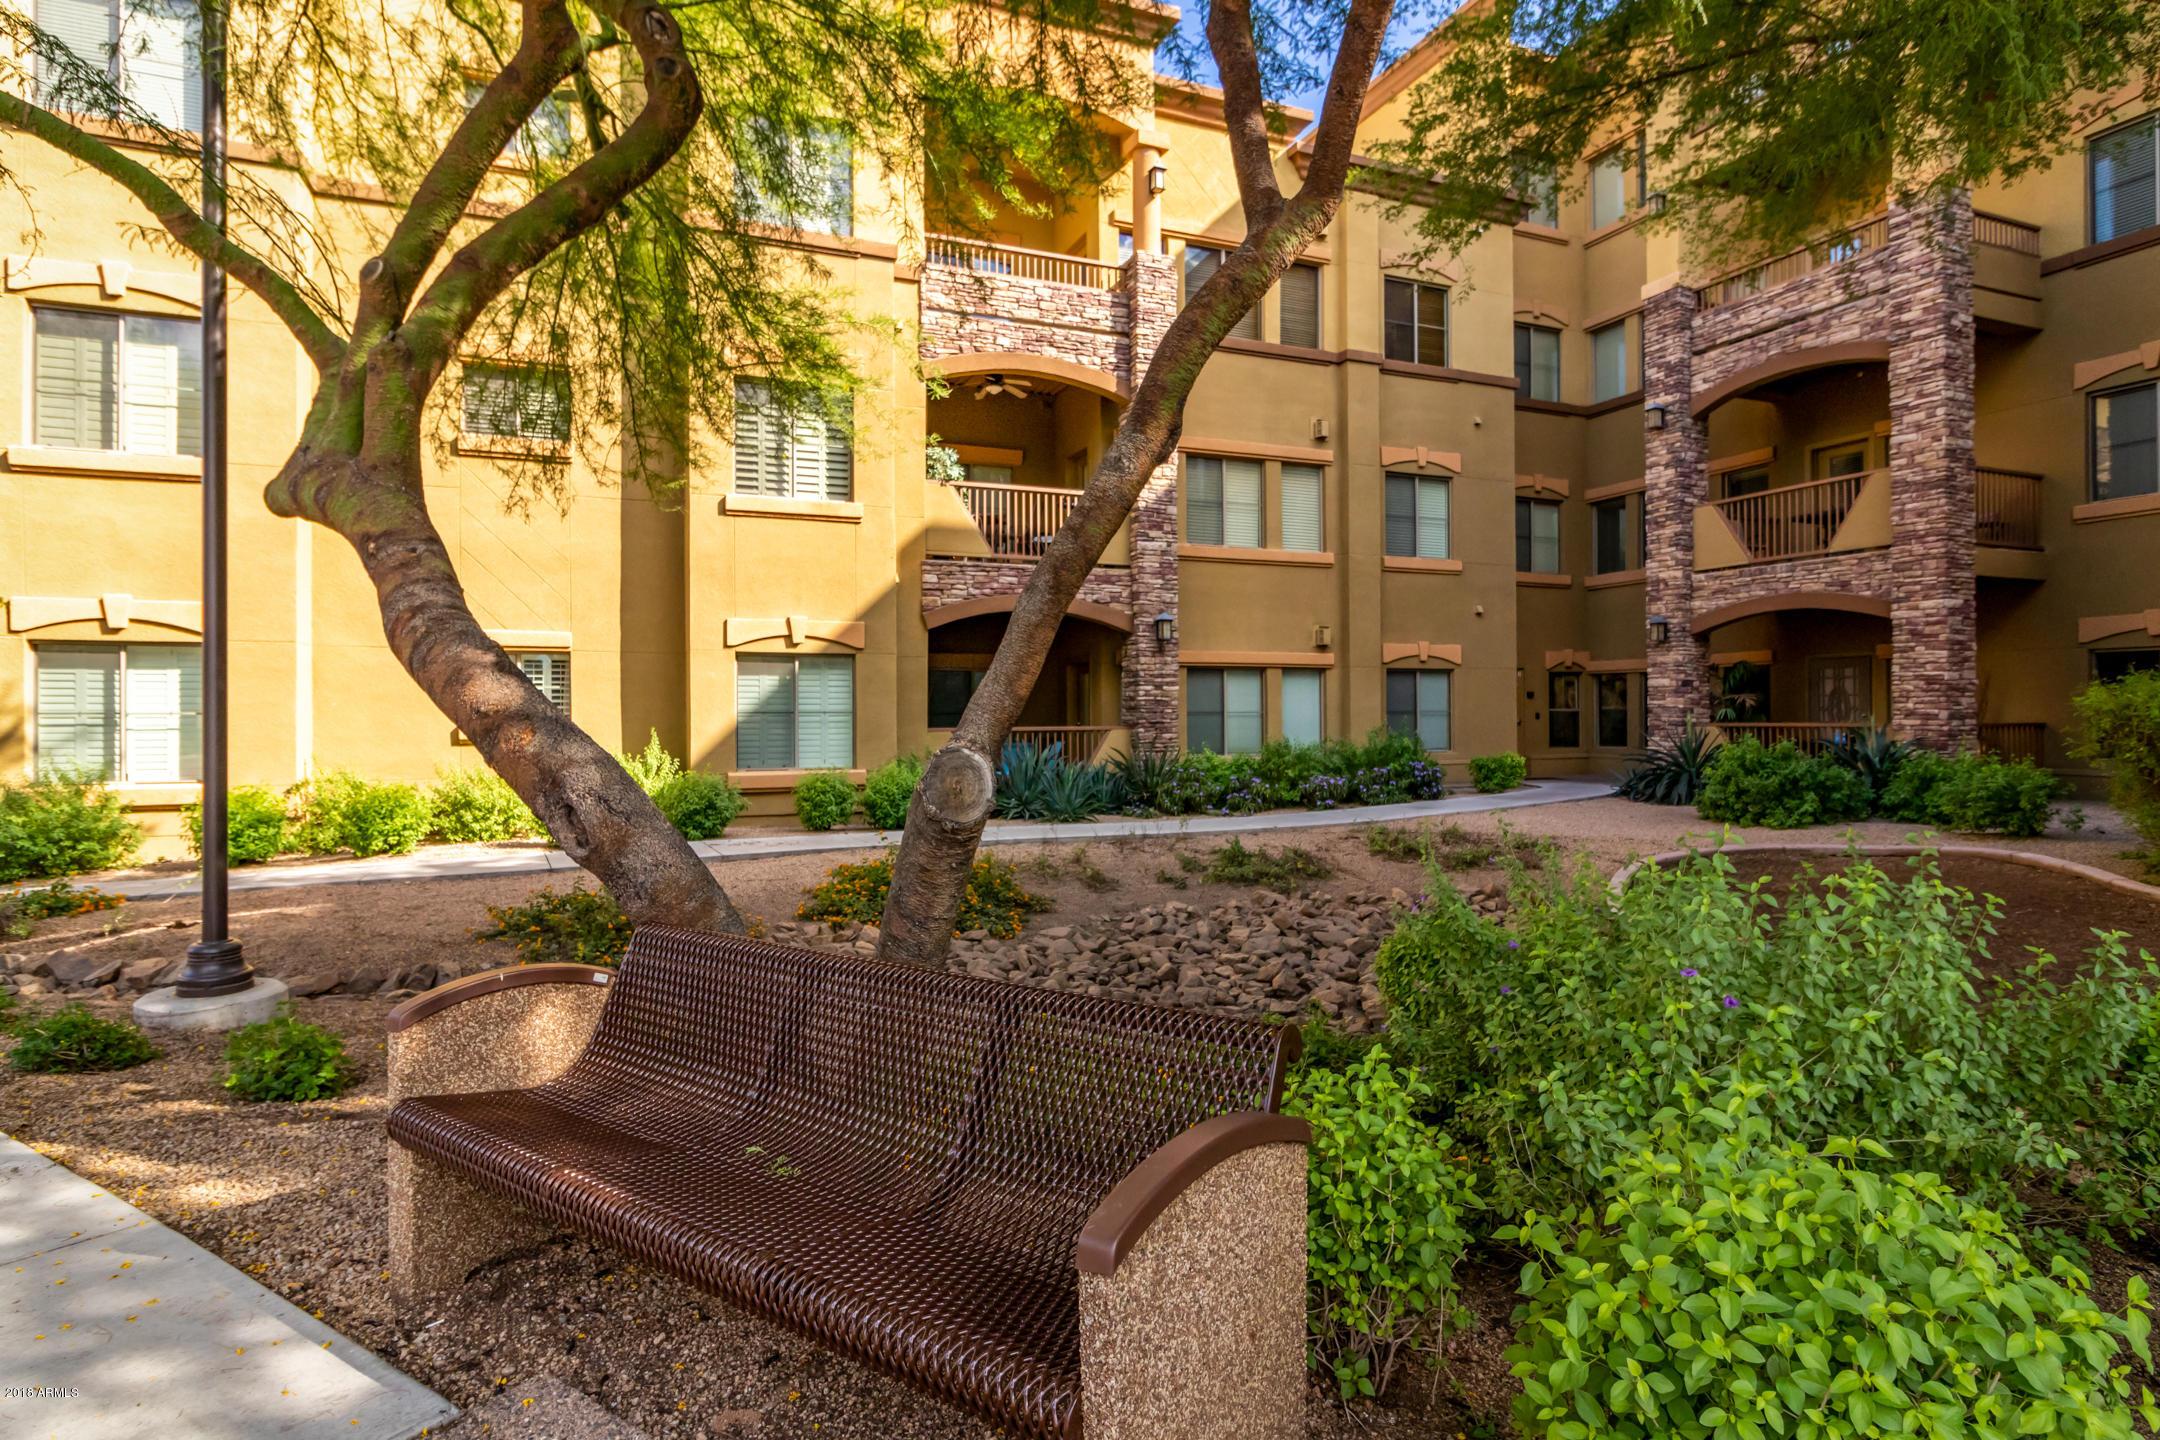 MLS 5830638 5450 E DEER VALLEY Drive Unit 4200 Building 11, Phoenix, AZ 85054 Phoenix AZ Short Sale